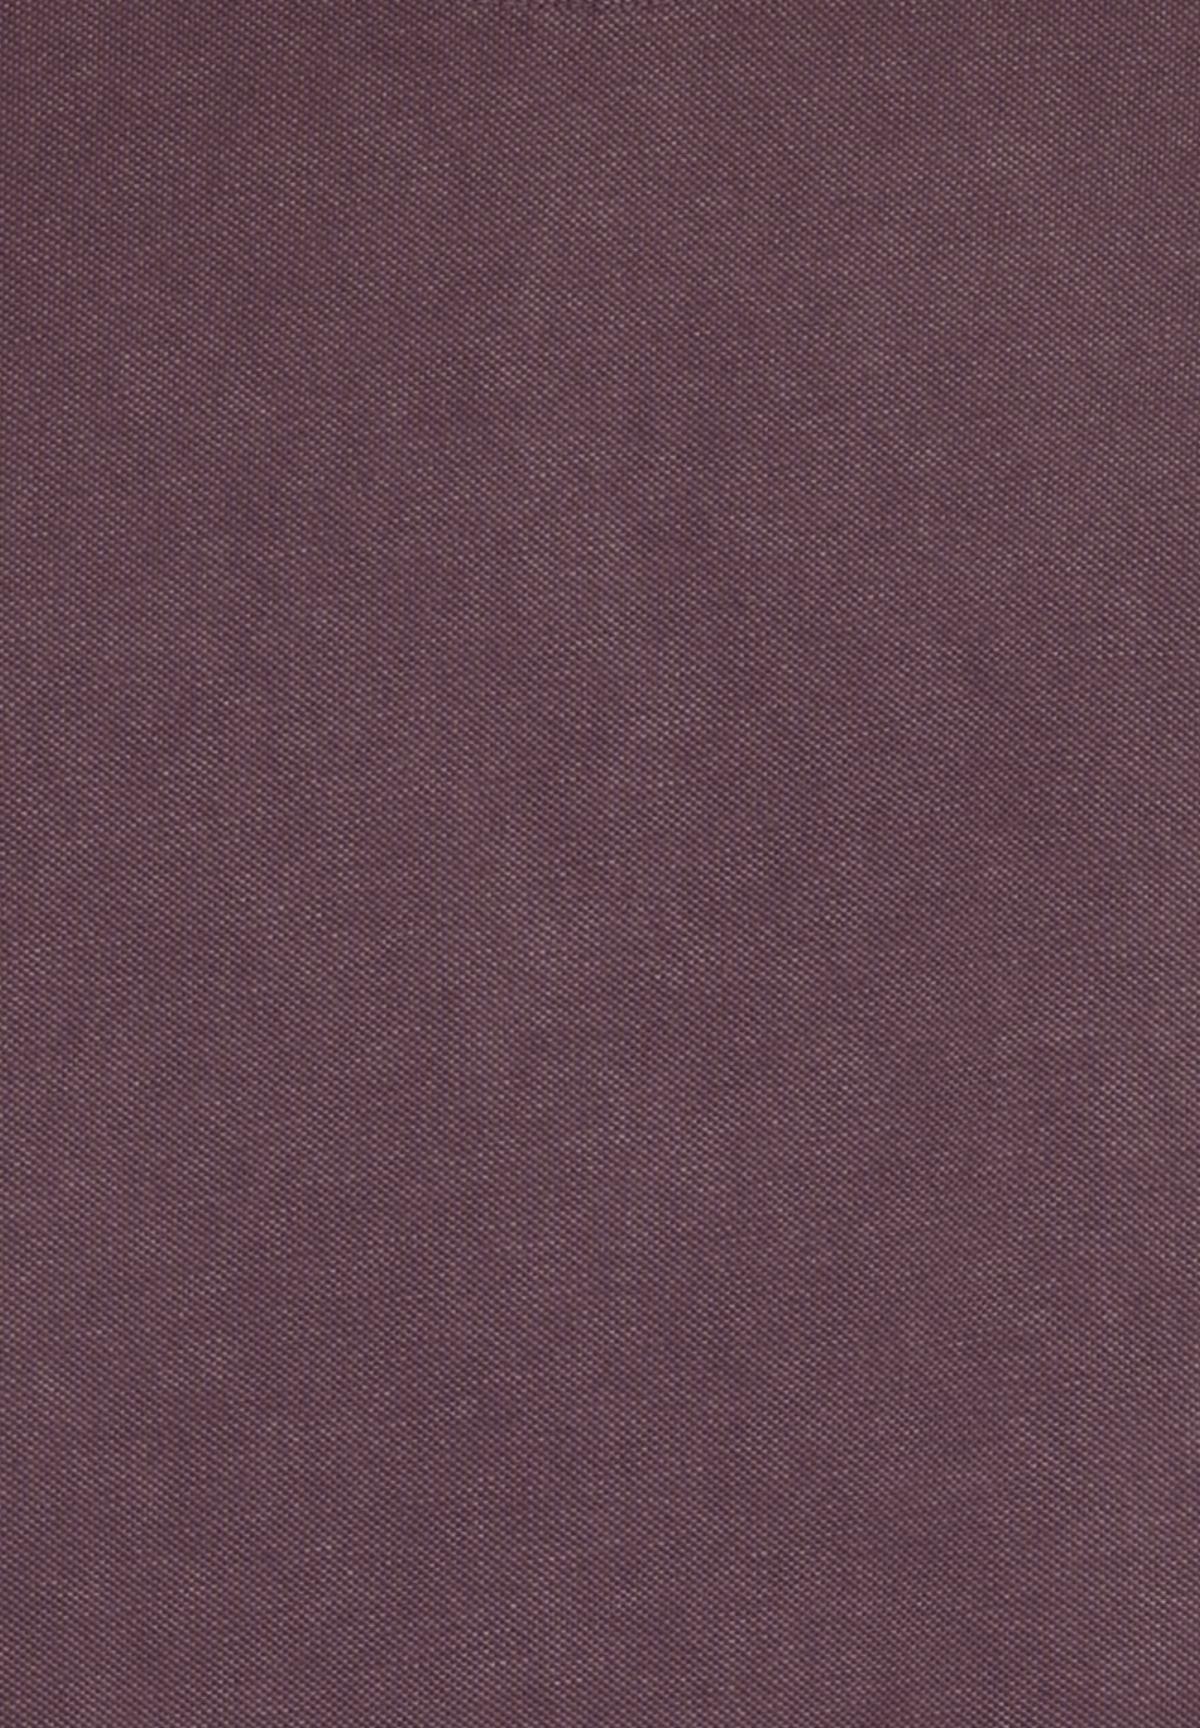 Camel-Active-Herren-Shirt-Poloshirt-Pique-Regular-Fit-NEU Indexbild 96